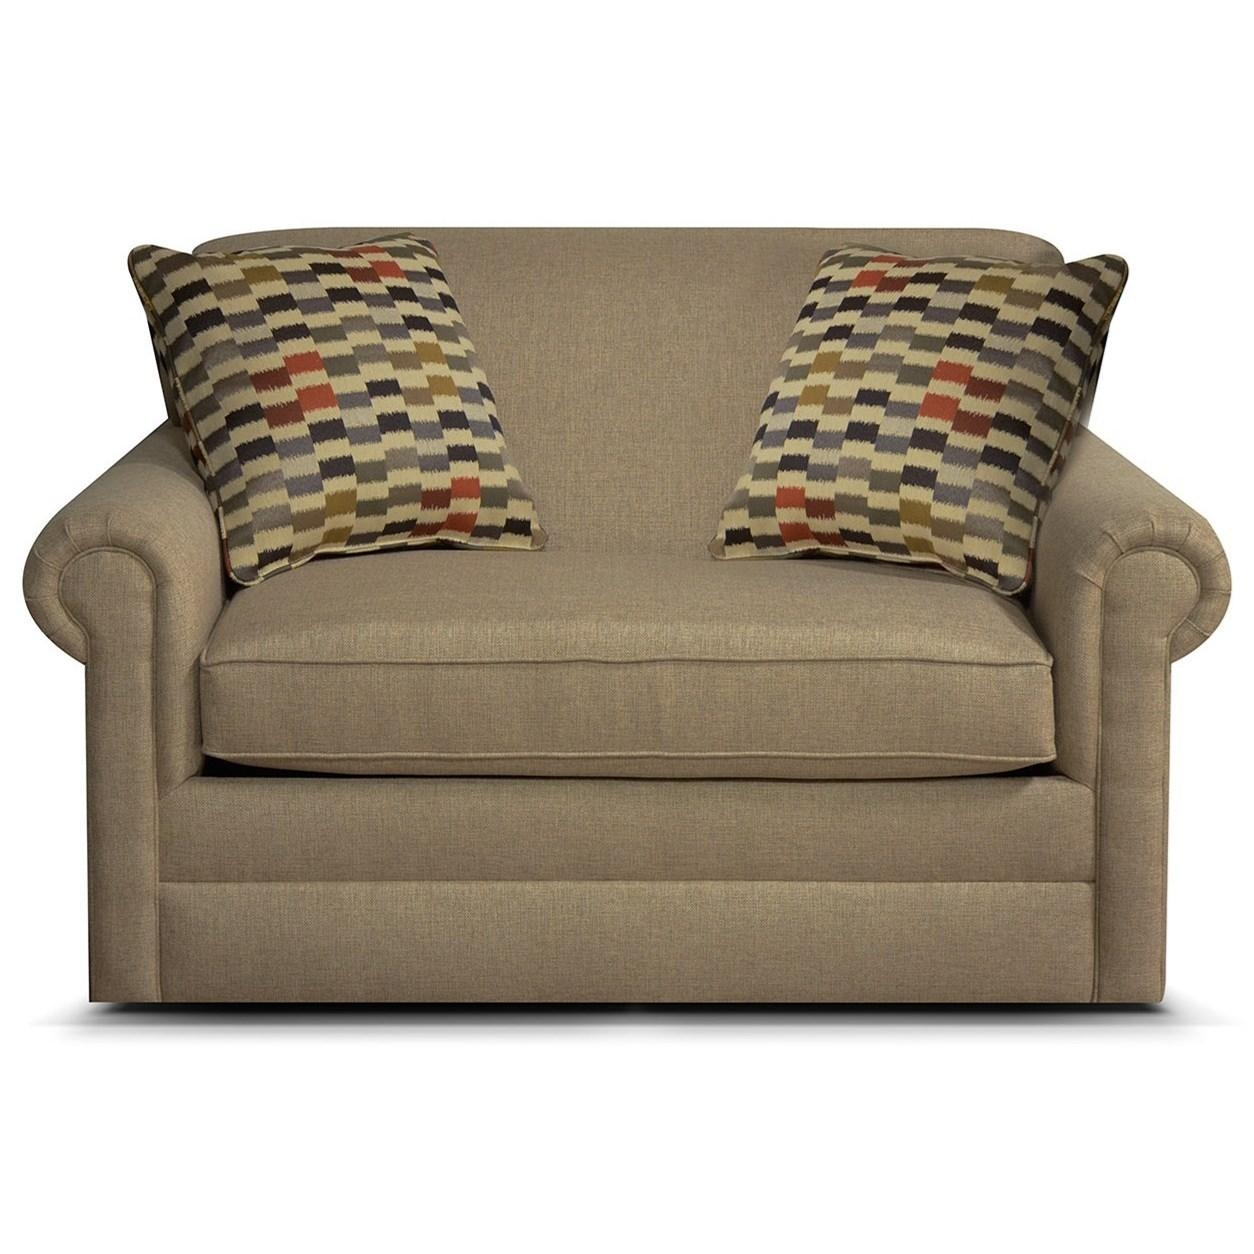 England Savona Twin Sleeper Sofa – Lindy's Furniture Company With Regard To Loveseat Twin Sleeper Sofas (View 8 of 20)